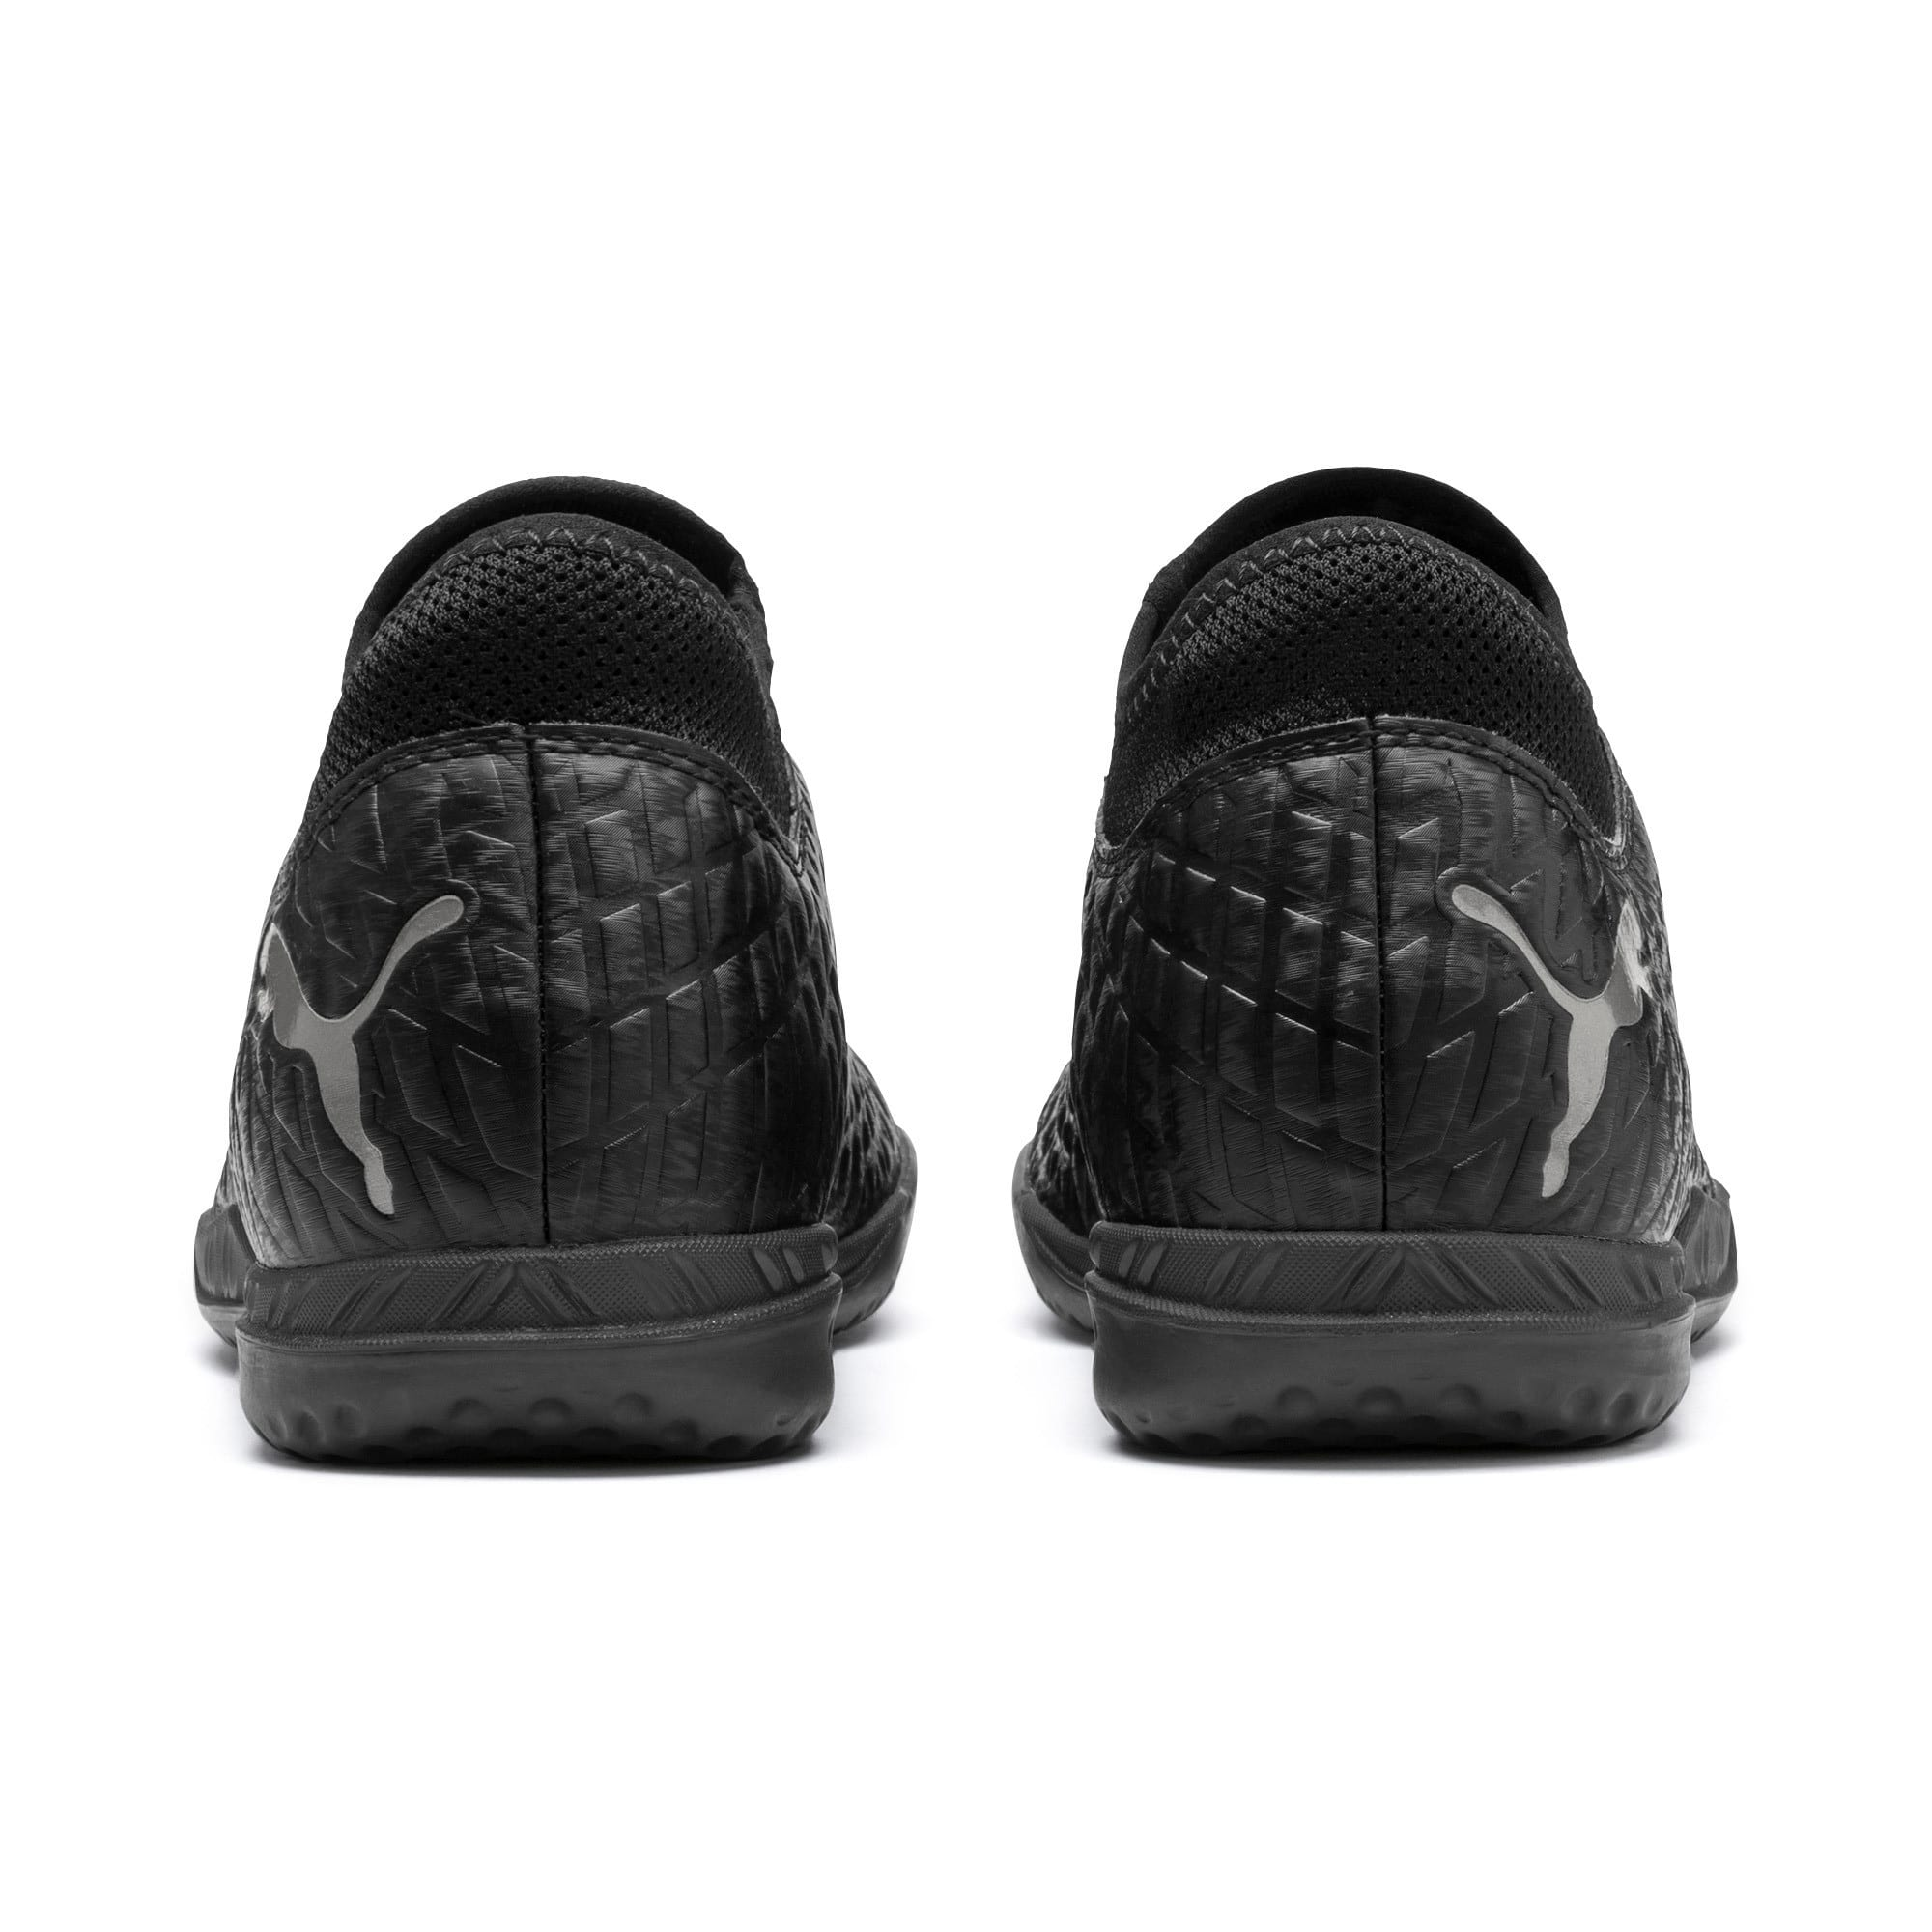 Thumbnail 4 of FUTURE 4.4 TT Men's Football Boots, Black-Black-Puma Aged Silver, medium